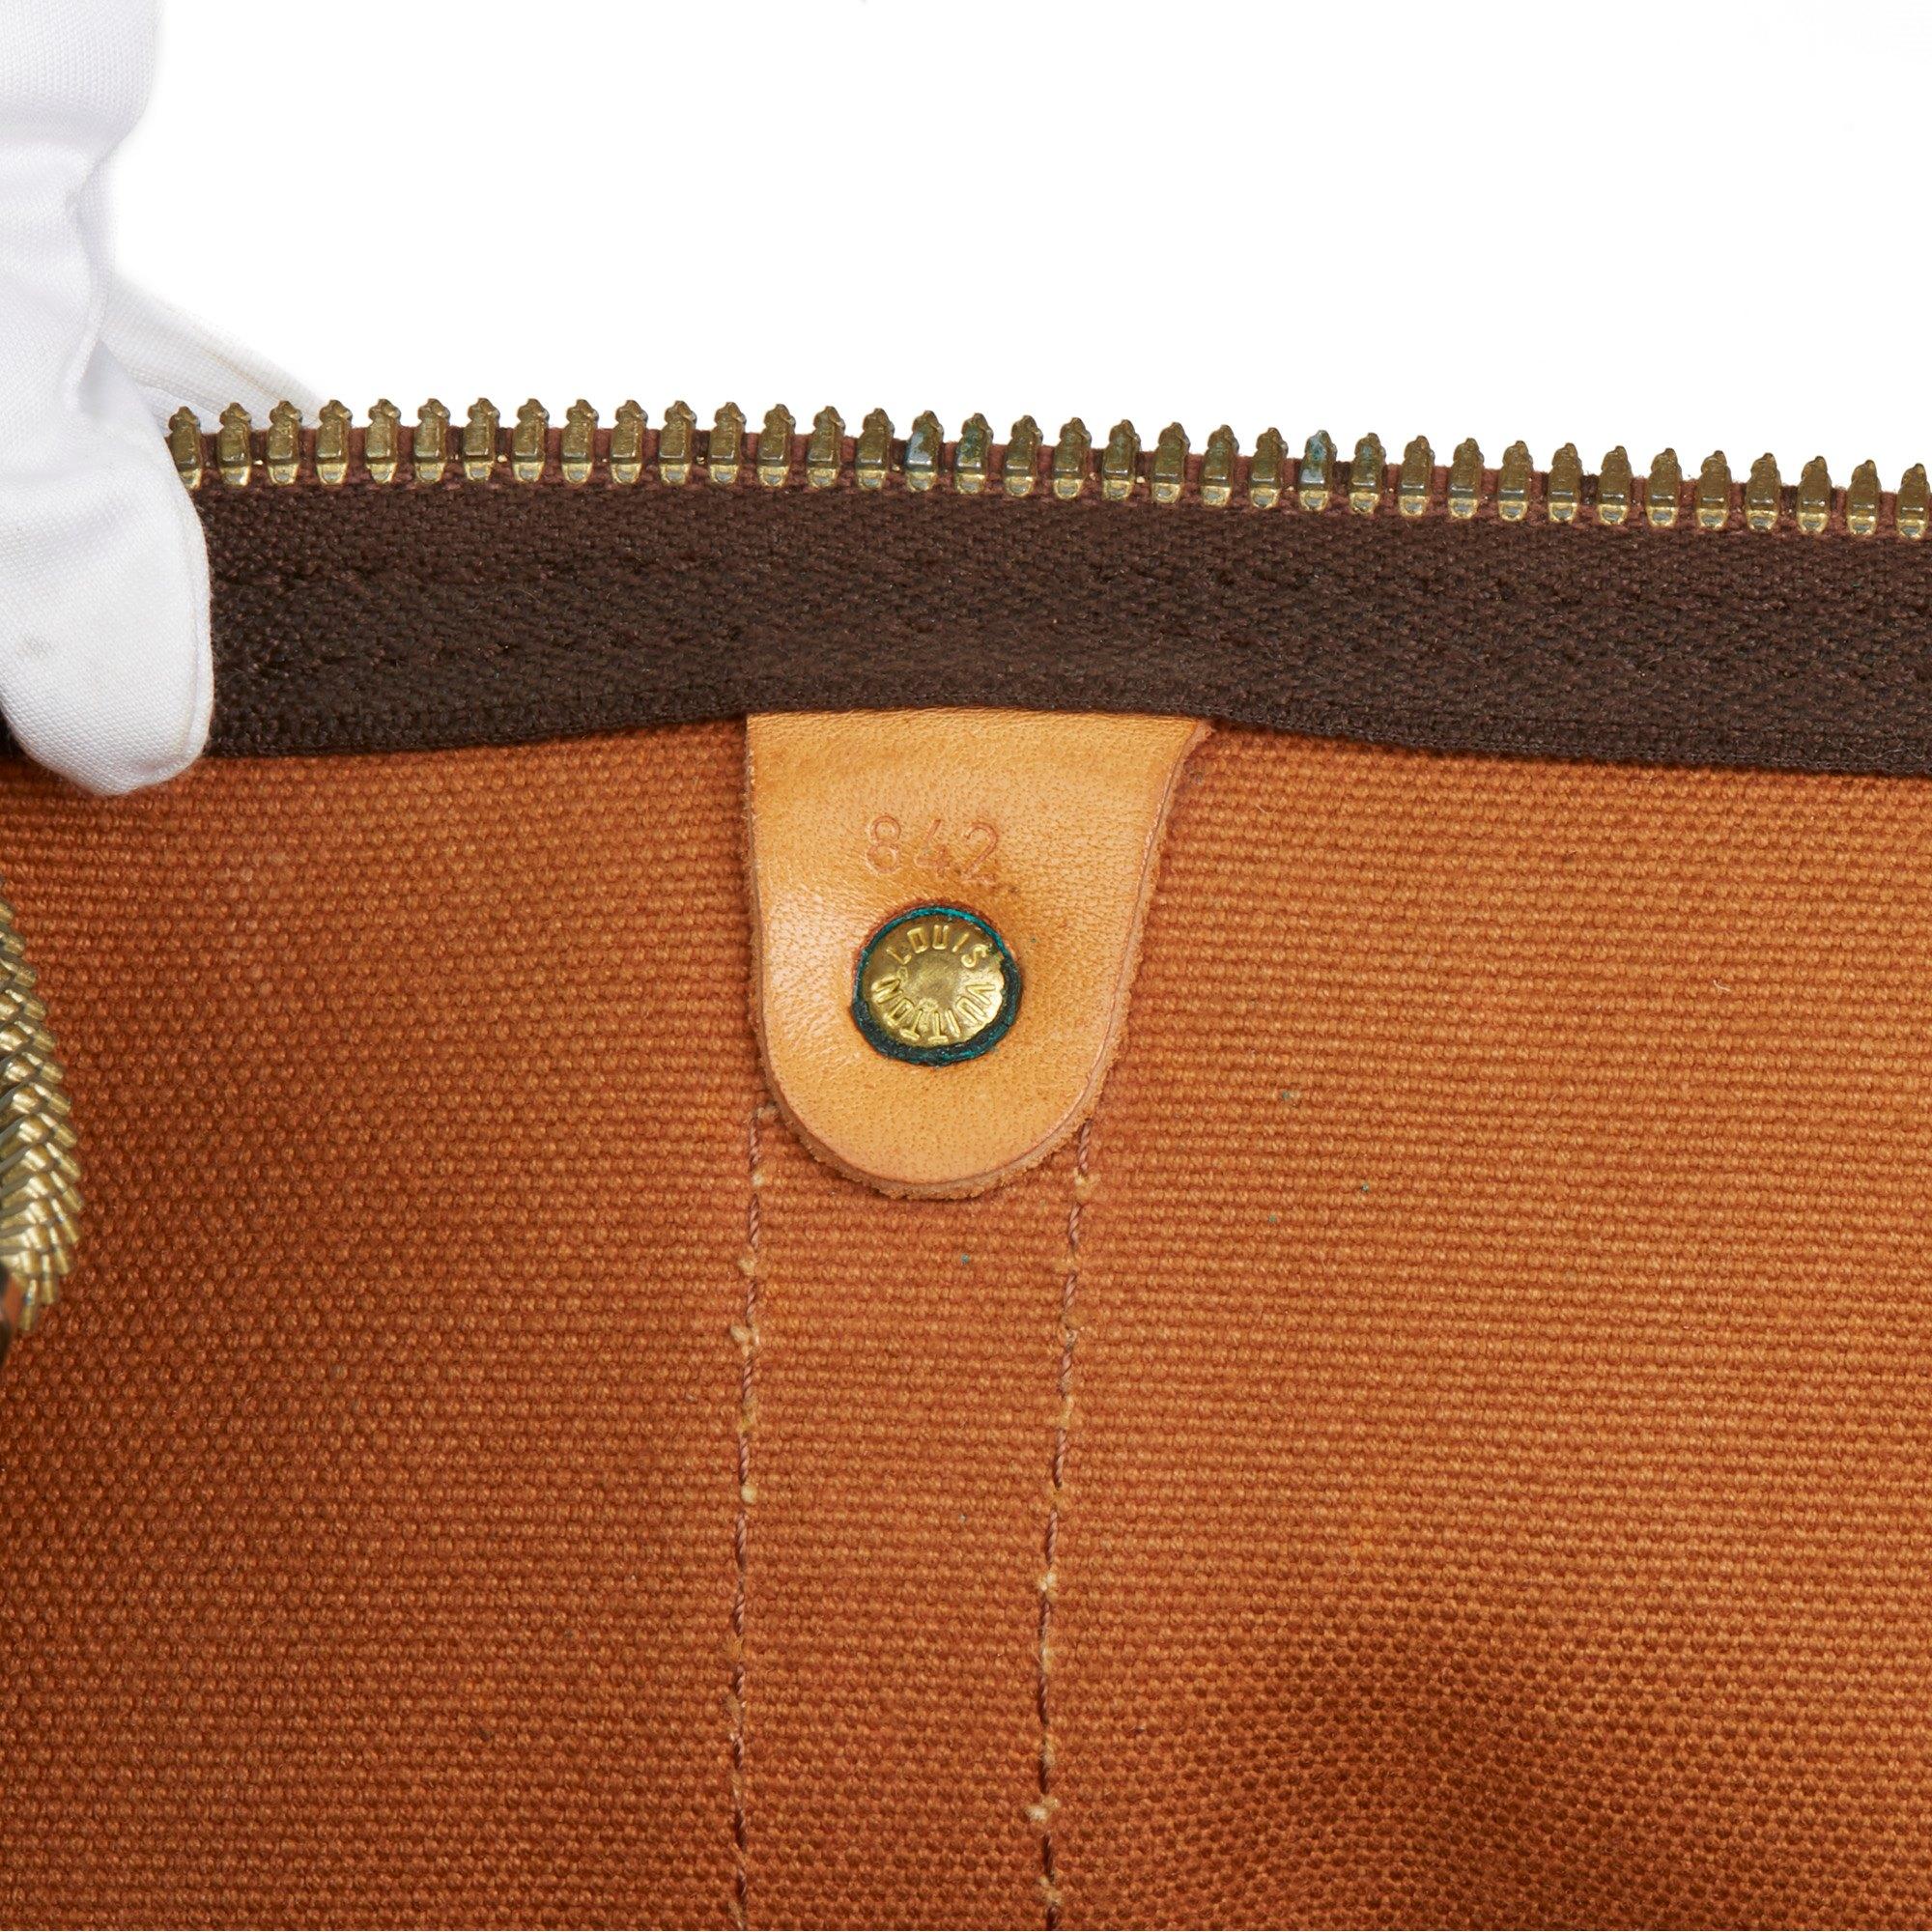 Louis Vuitton Brown Monogram Coated Canvas & Vachetta Leather Vintage Keepall 50